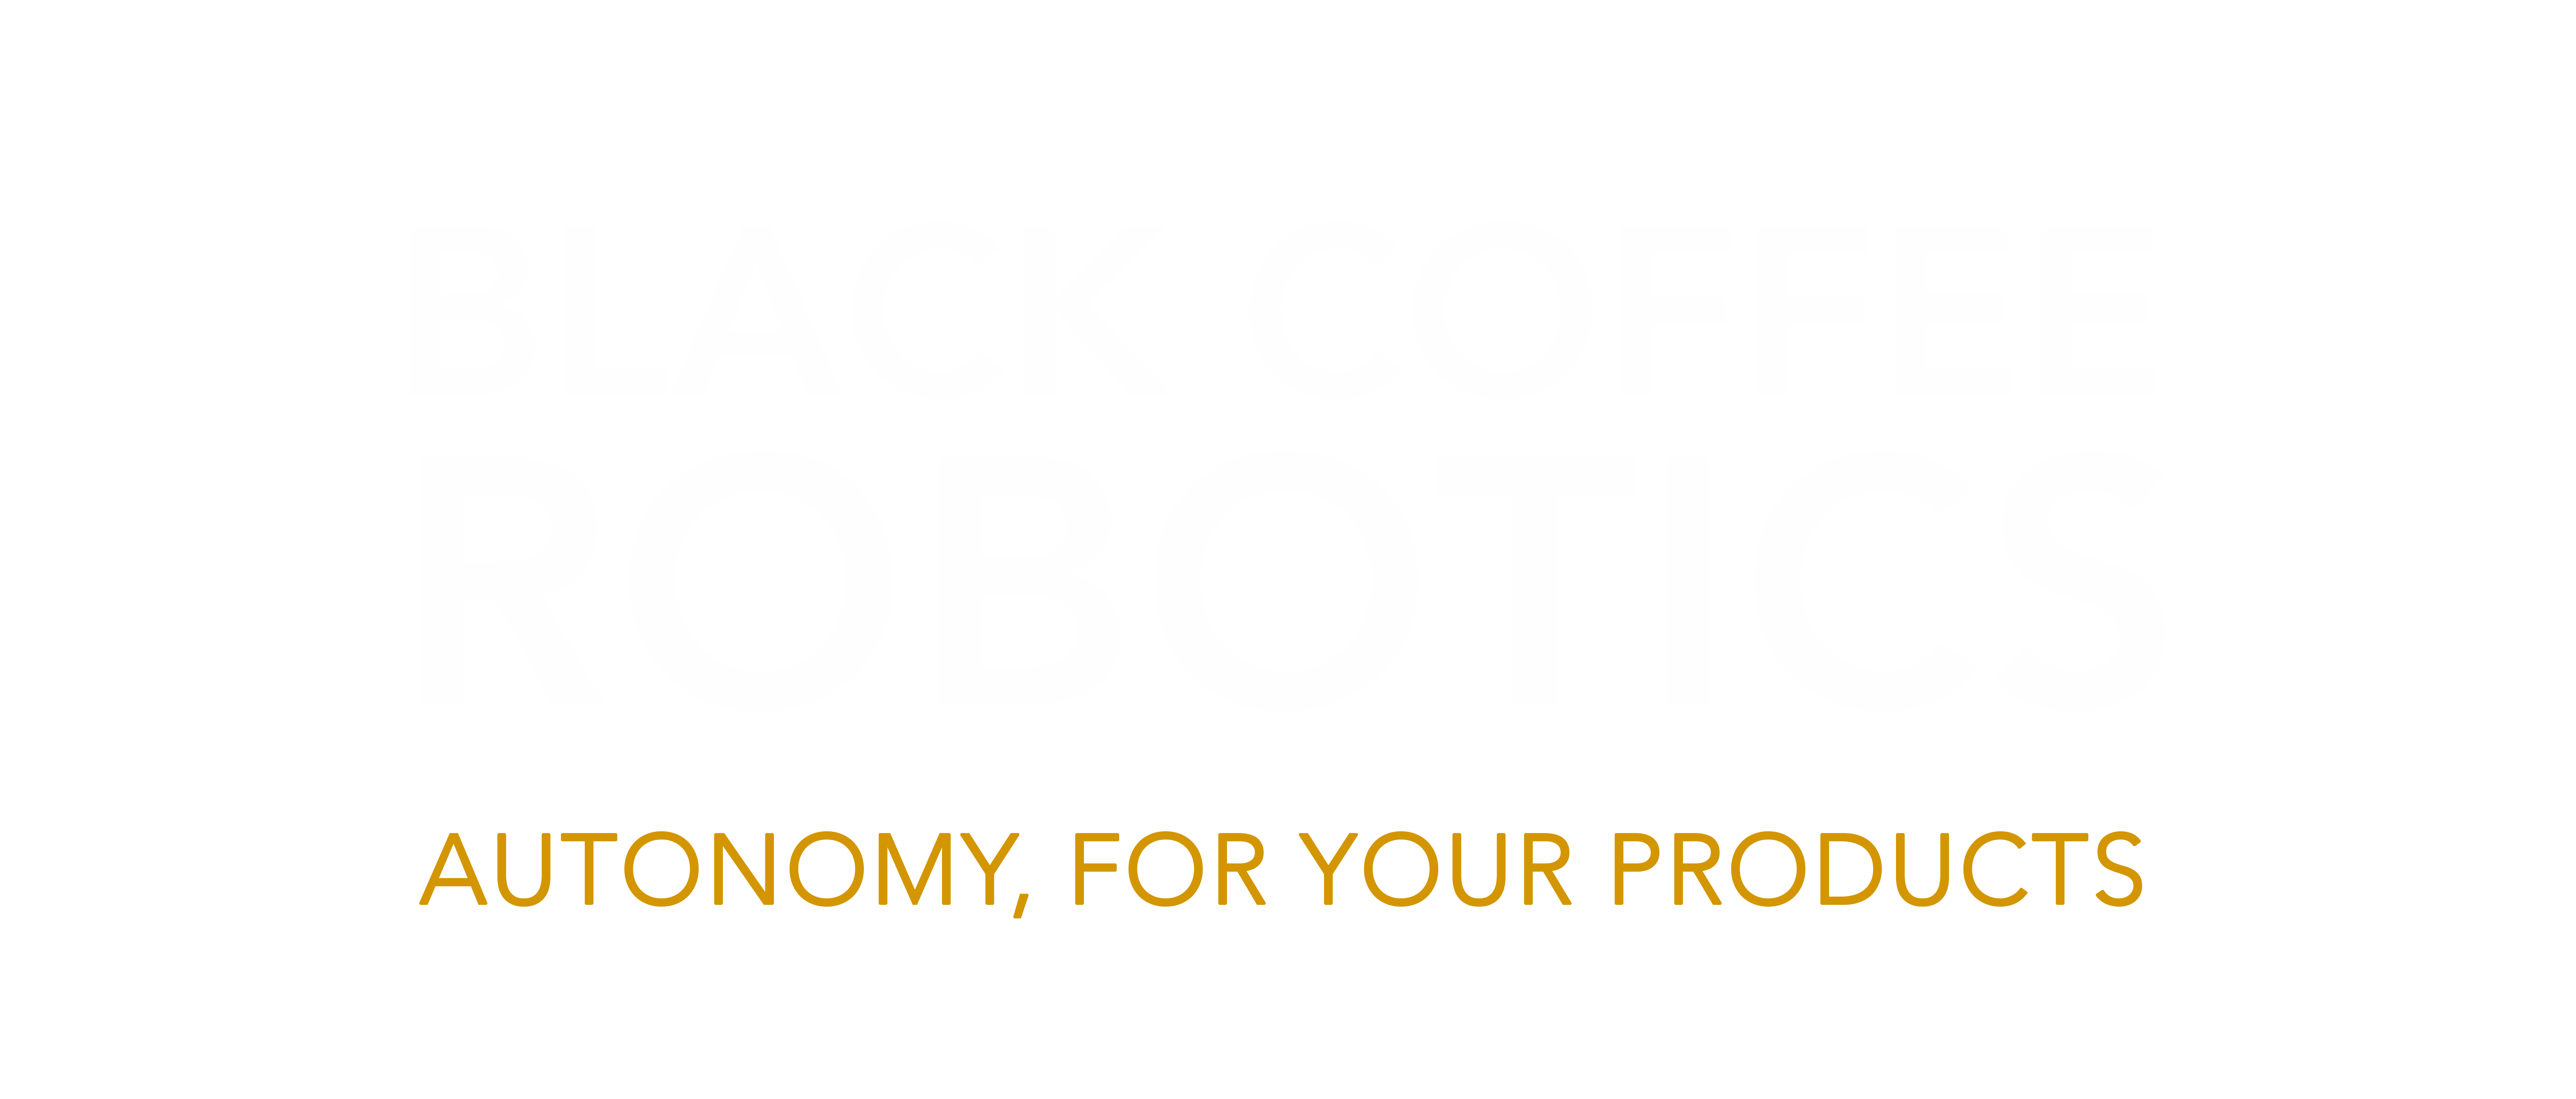 Black Coffee Robotics